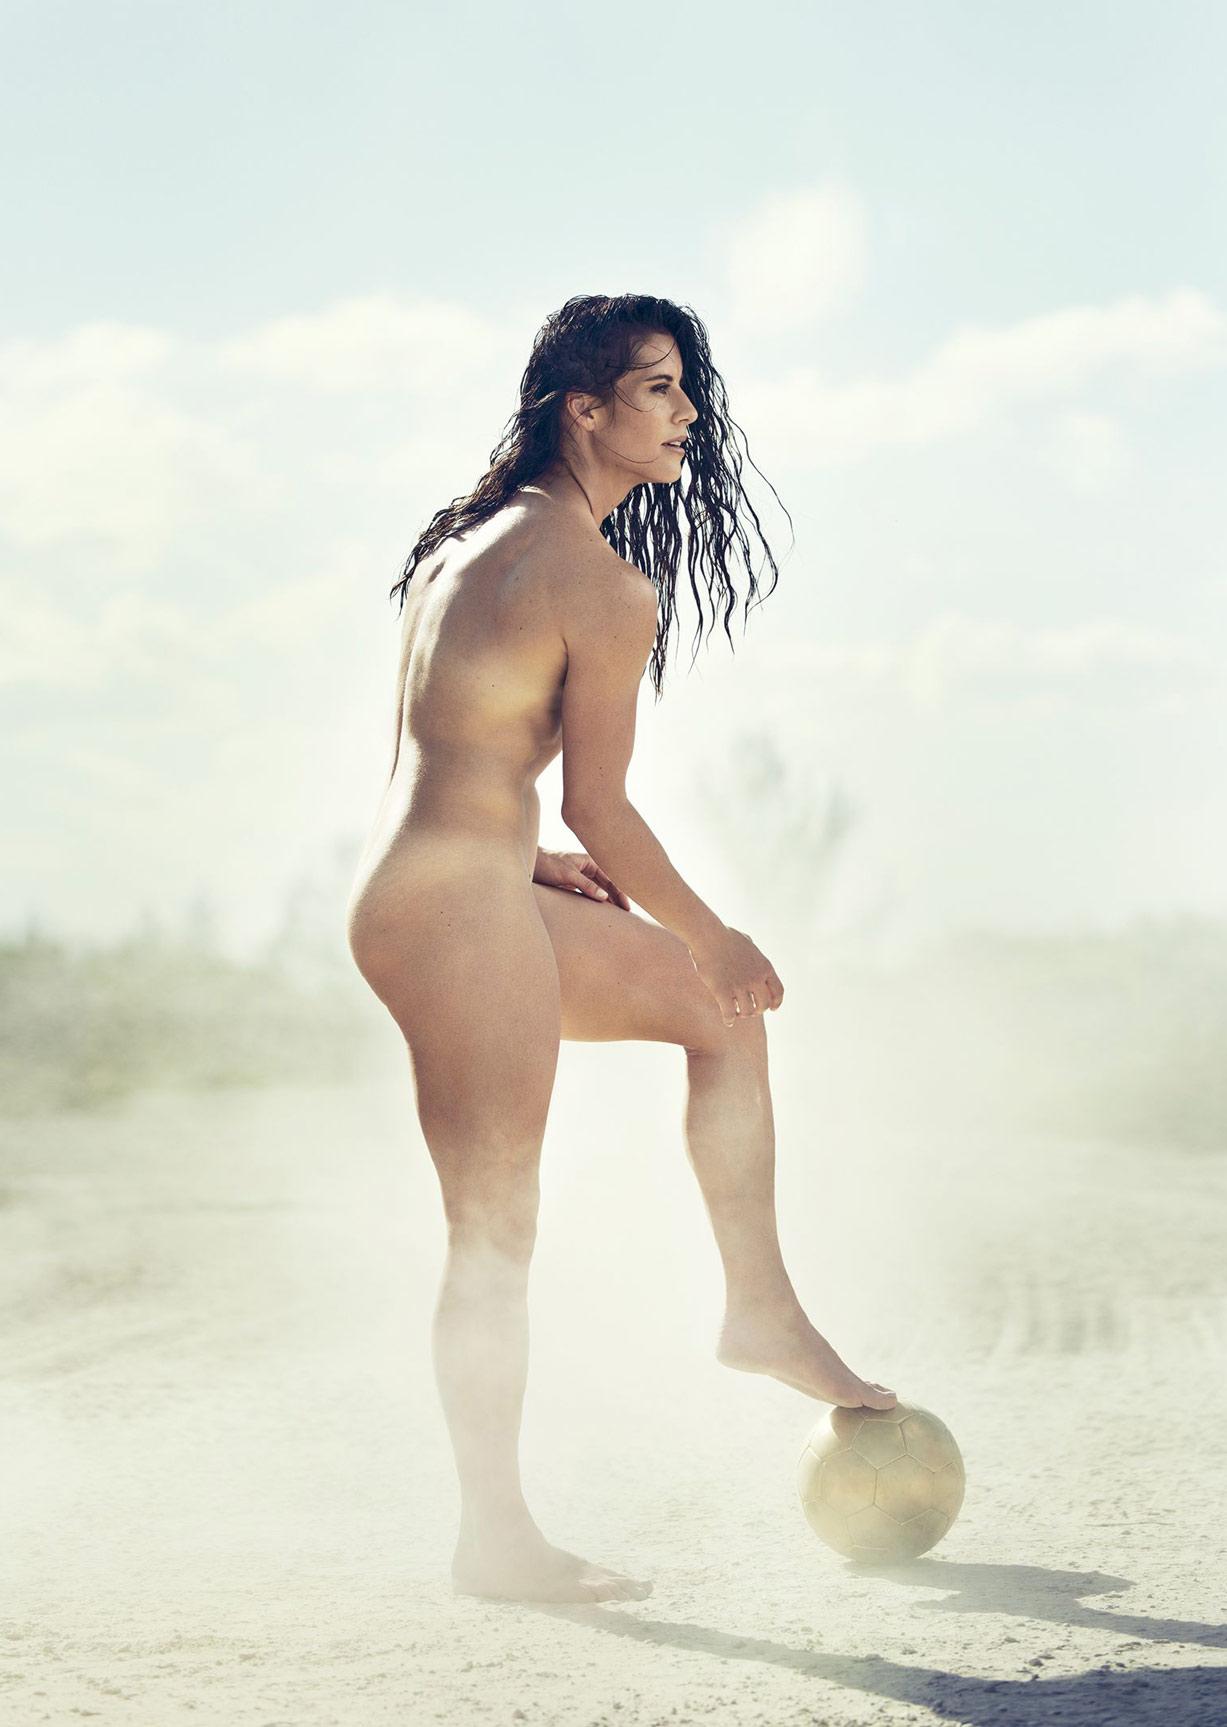 ESPN Magazine The Body Issue 2015 - Ali Krieger / Али Кригер - Культ тела журнала ESPN